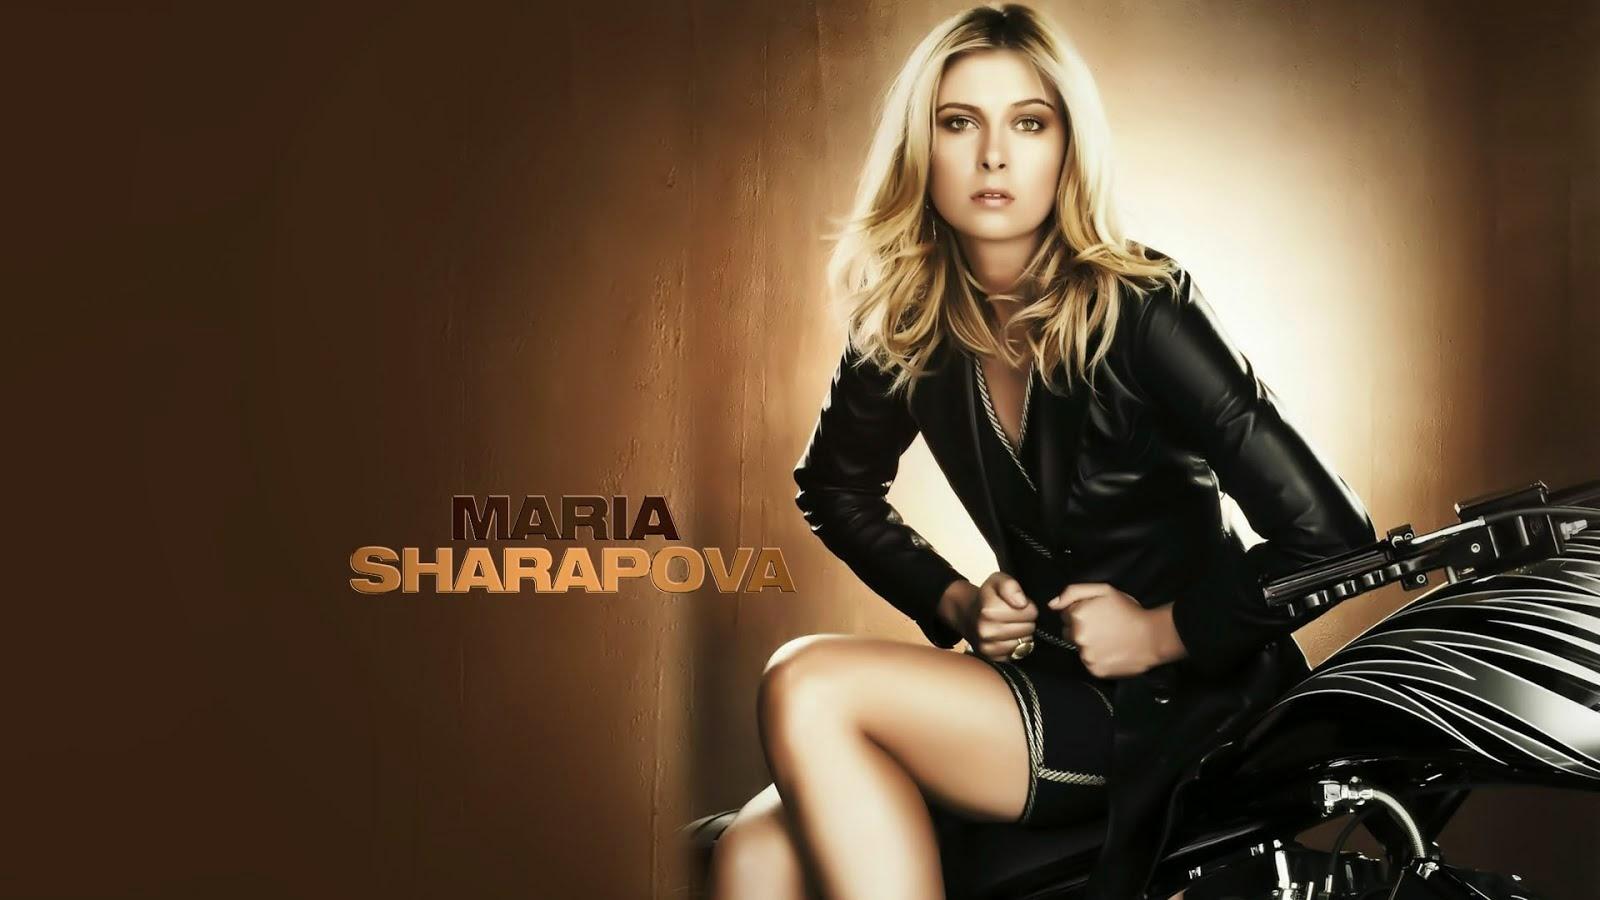 Maria Sharapova Wallpapers Free Download Wallpapersafari